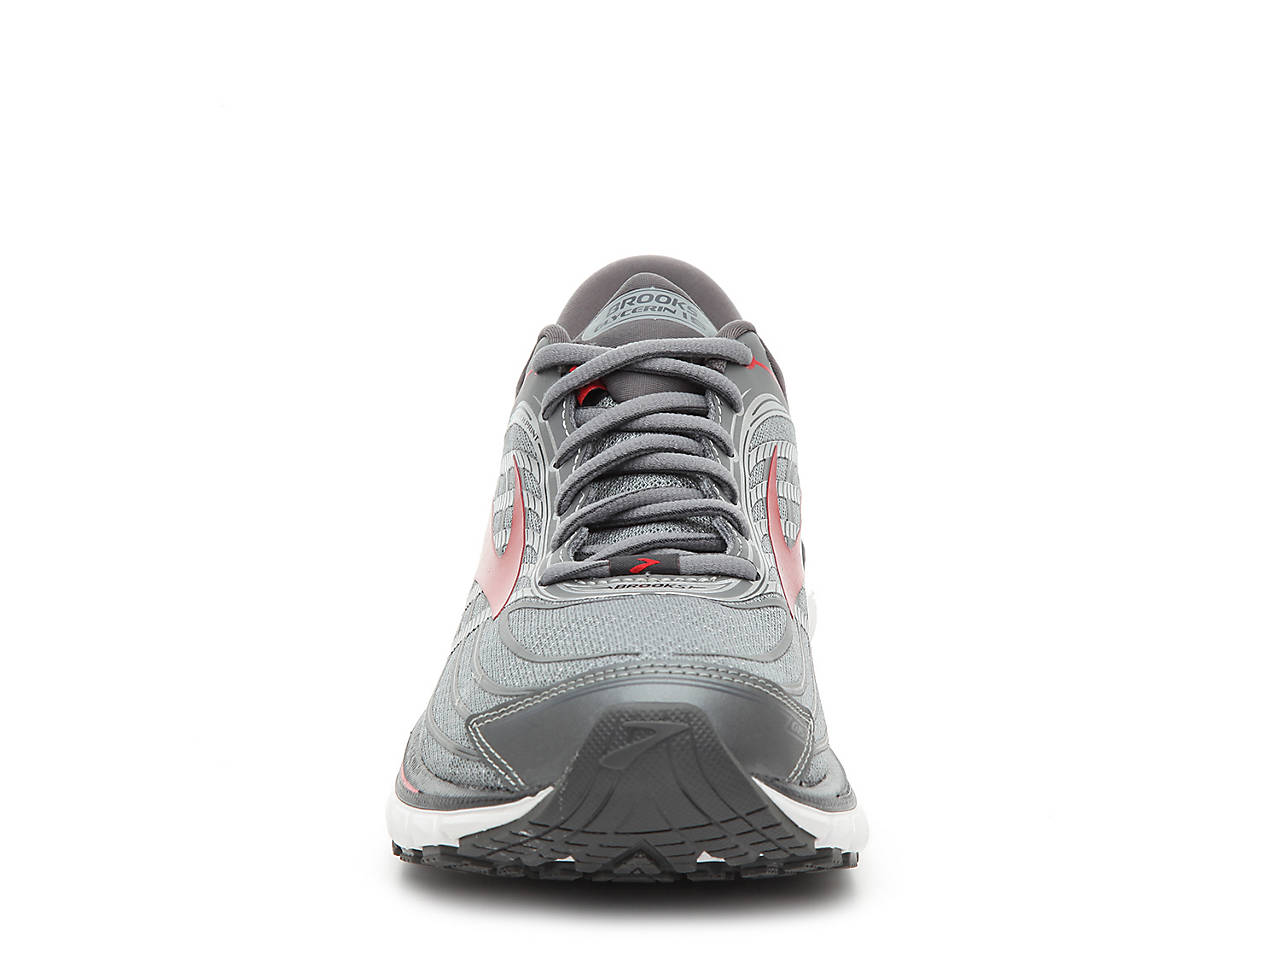 Men's Dsw Shoe Shoes Brooks 15 Running Glycerin xCIAqH